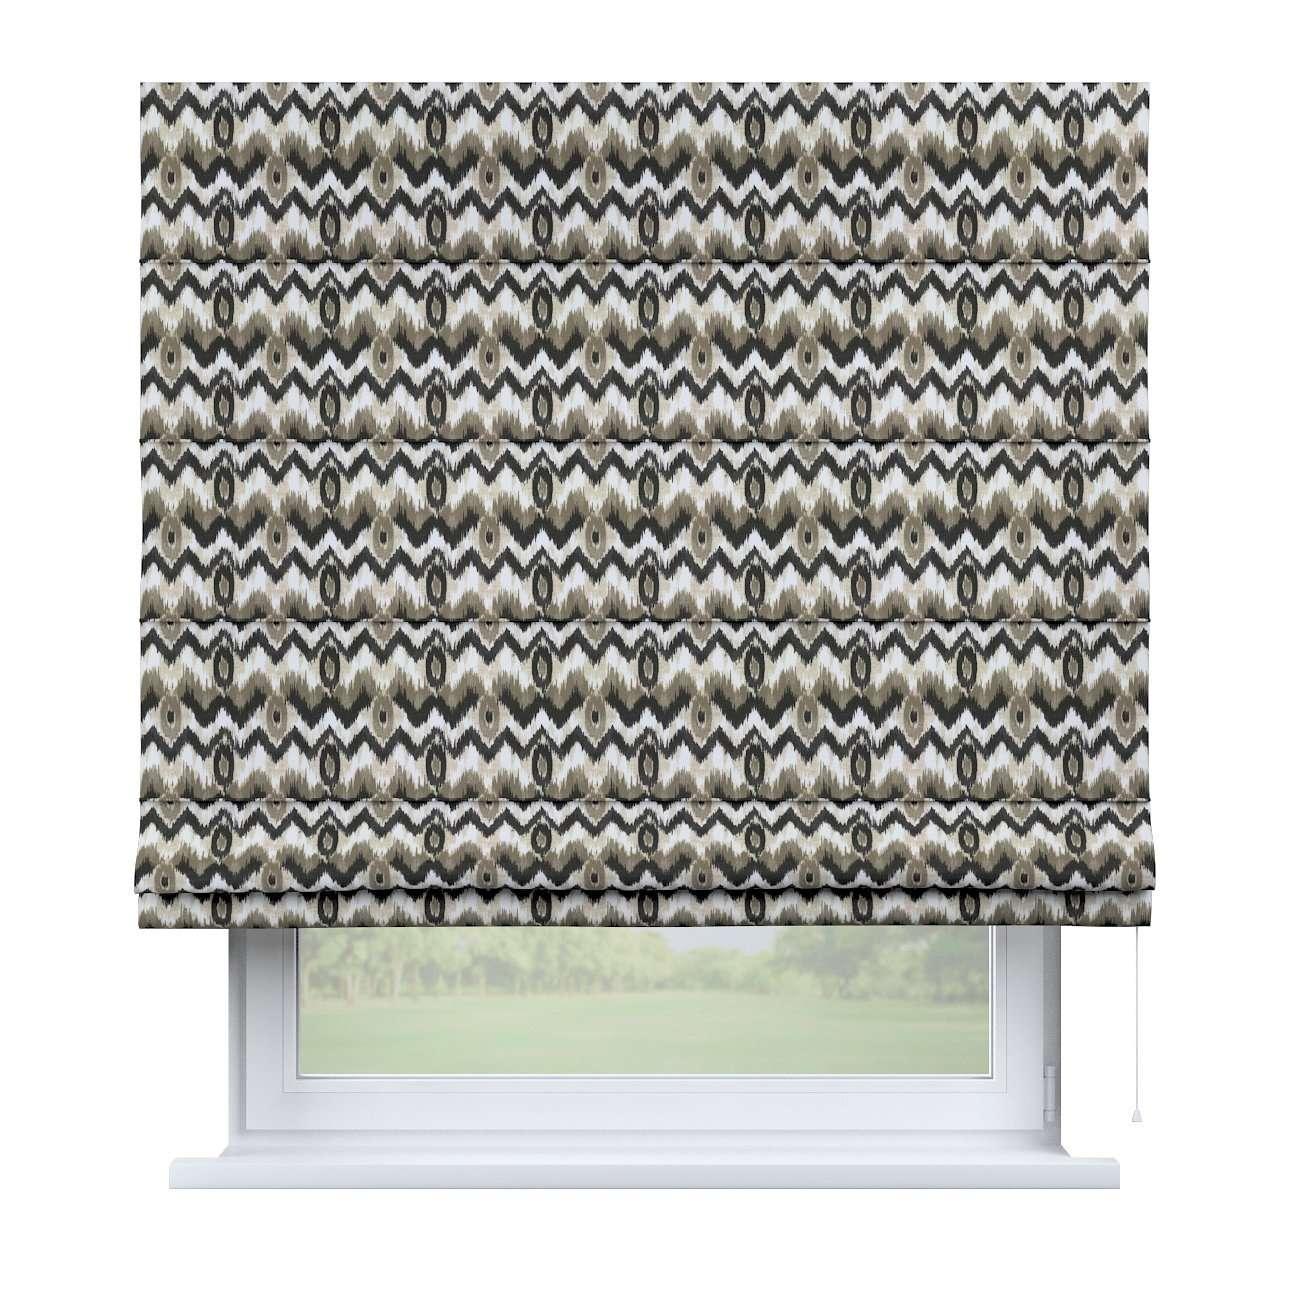 Raffrollo Capri, schwarz-beige, 100 × 170 cm, Modern